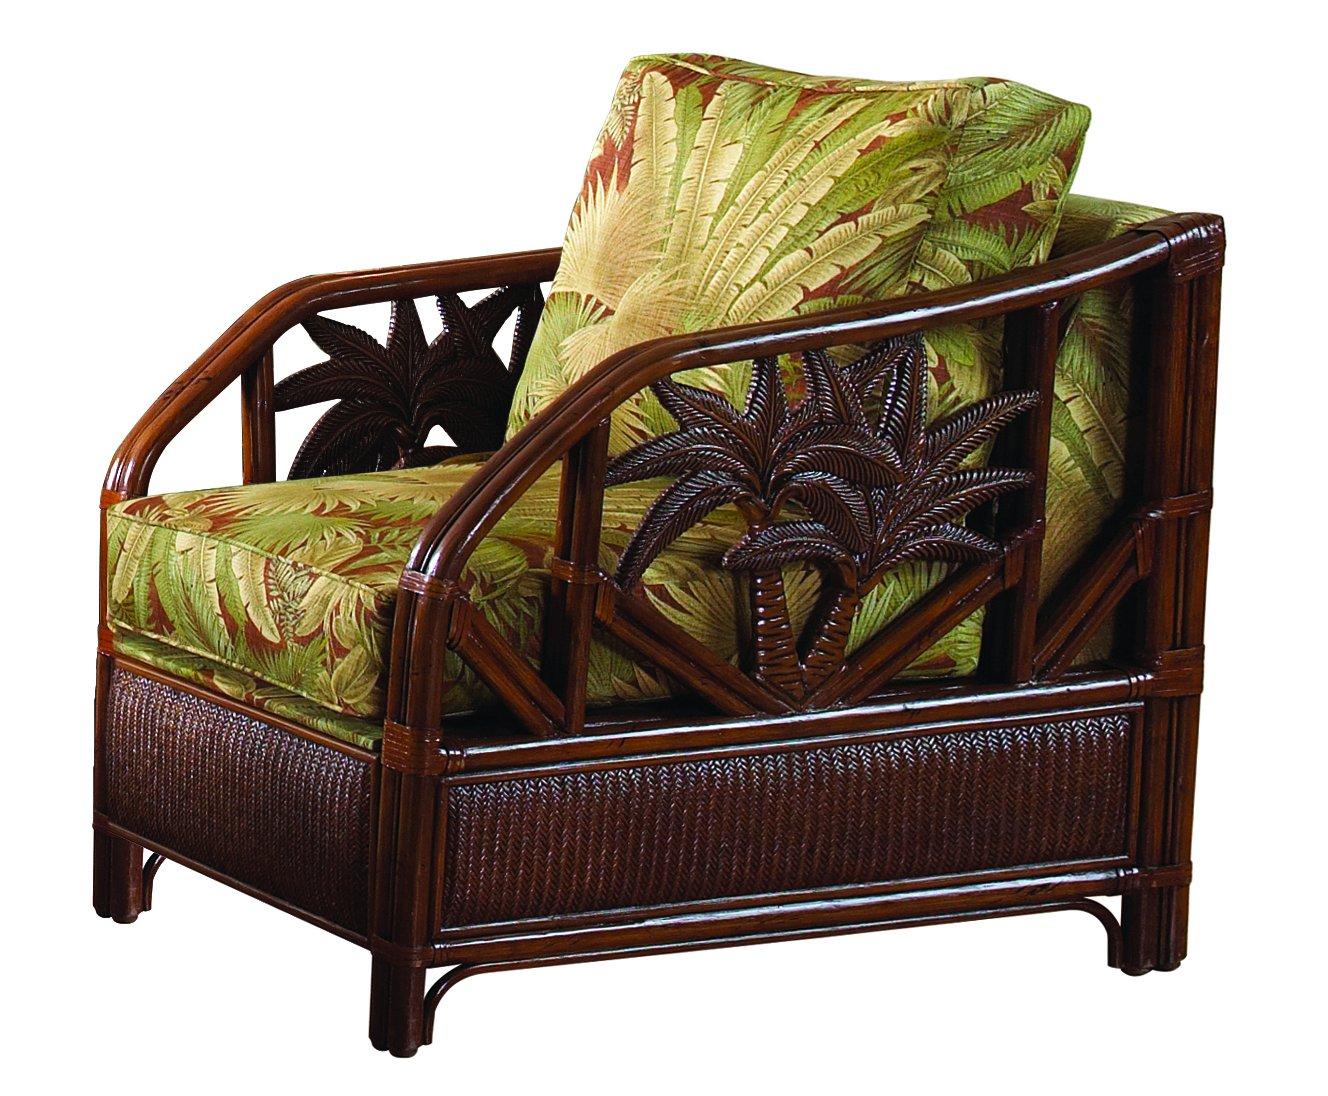 Hospitality Rattan 401-1365-TCA-C Cancun Palm Upholstered Rattan & Wicker Lounge Chair, Sunbrella Canvas Spa